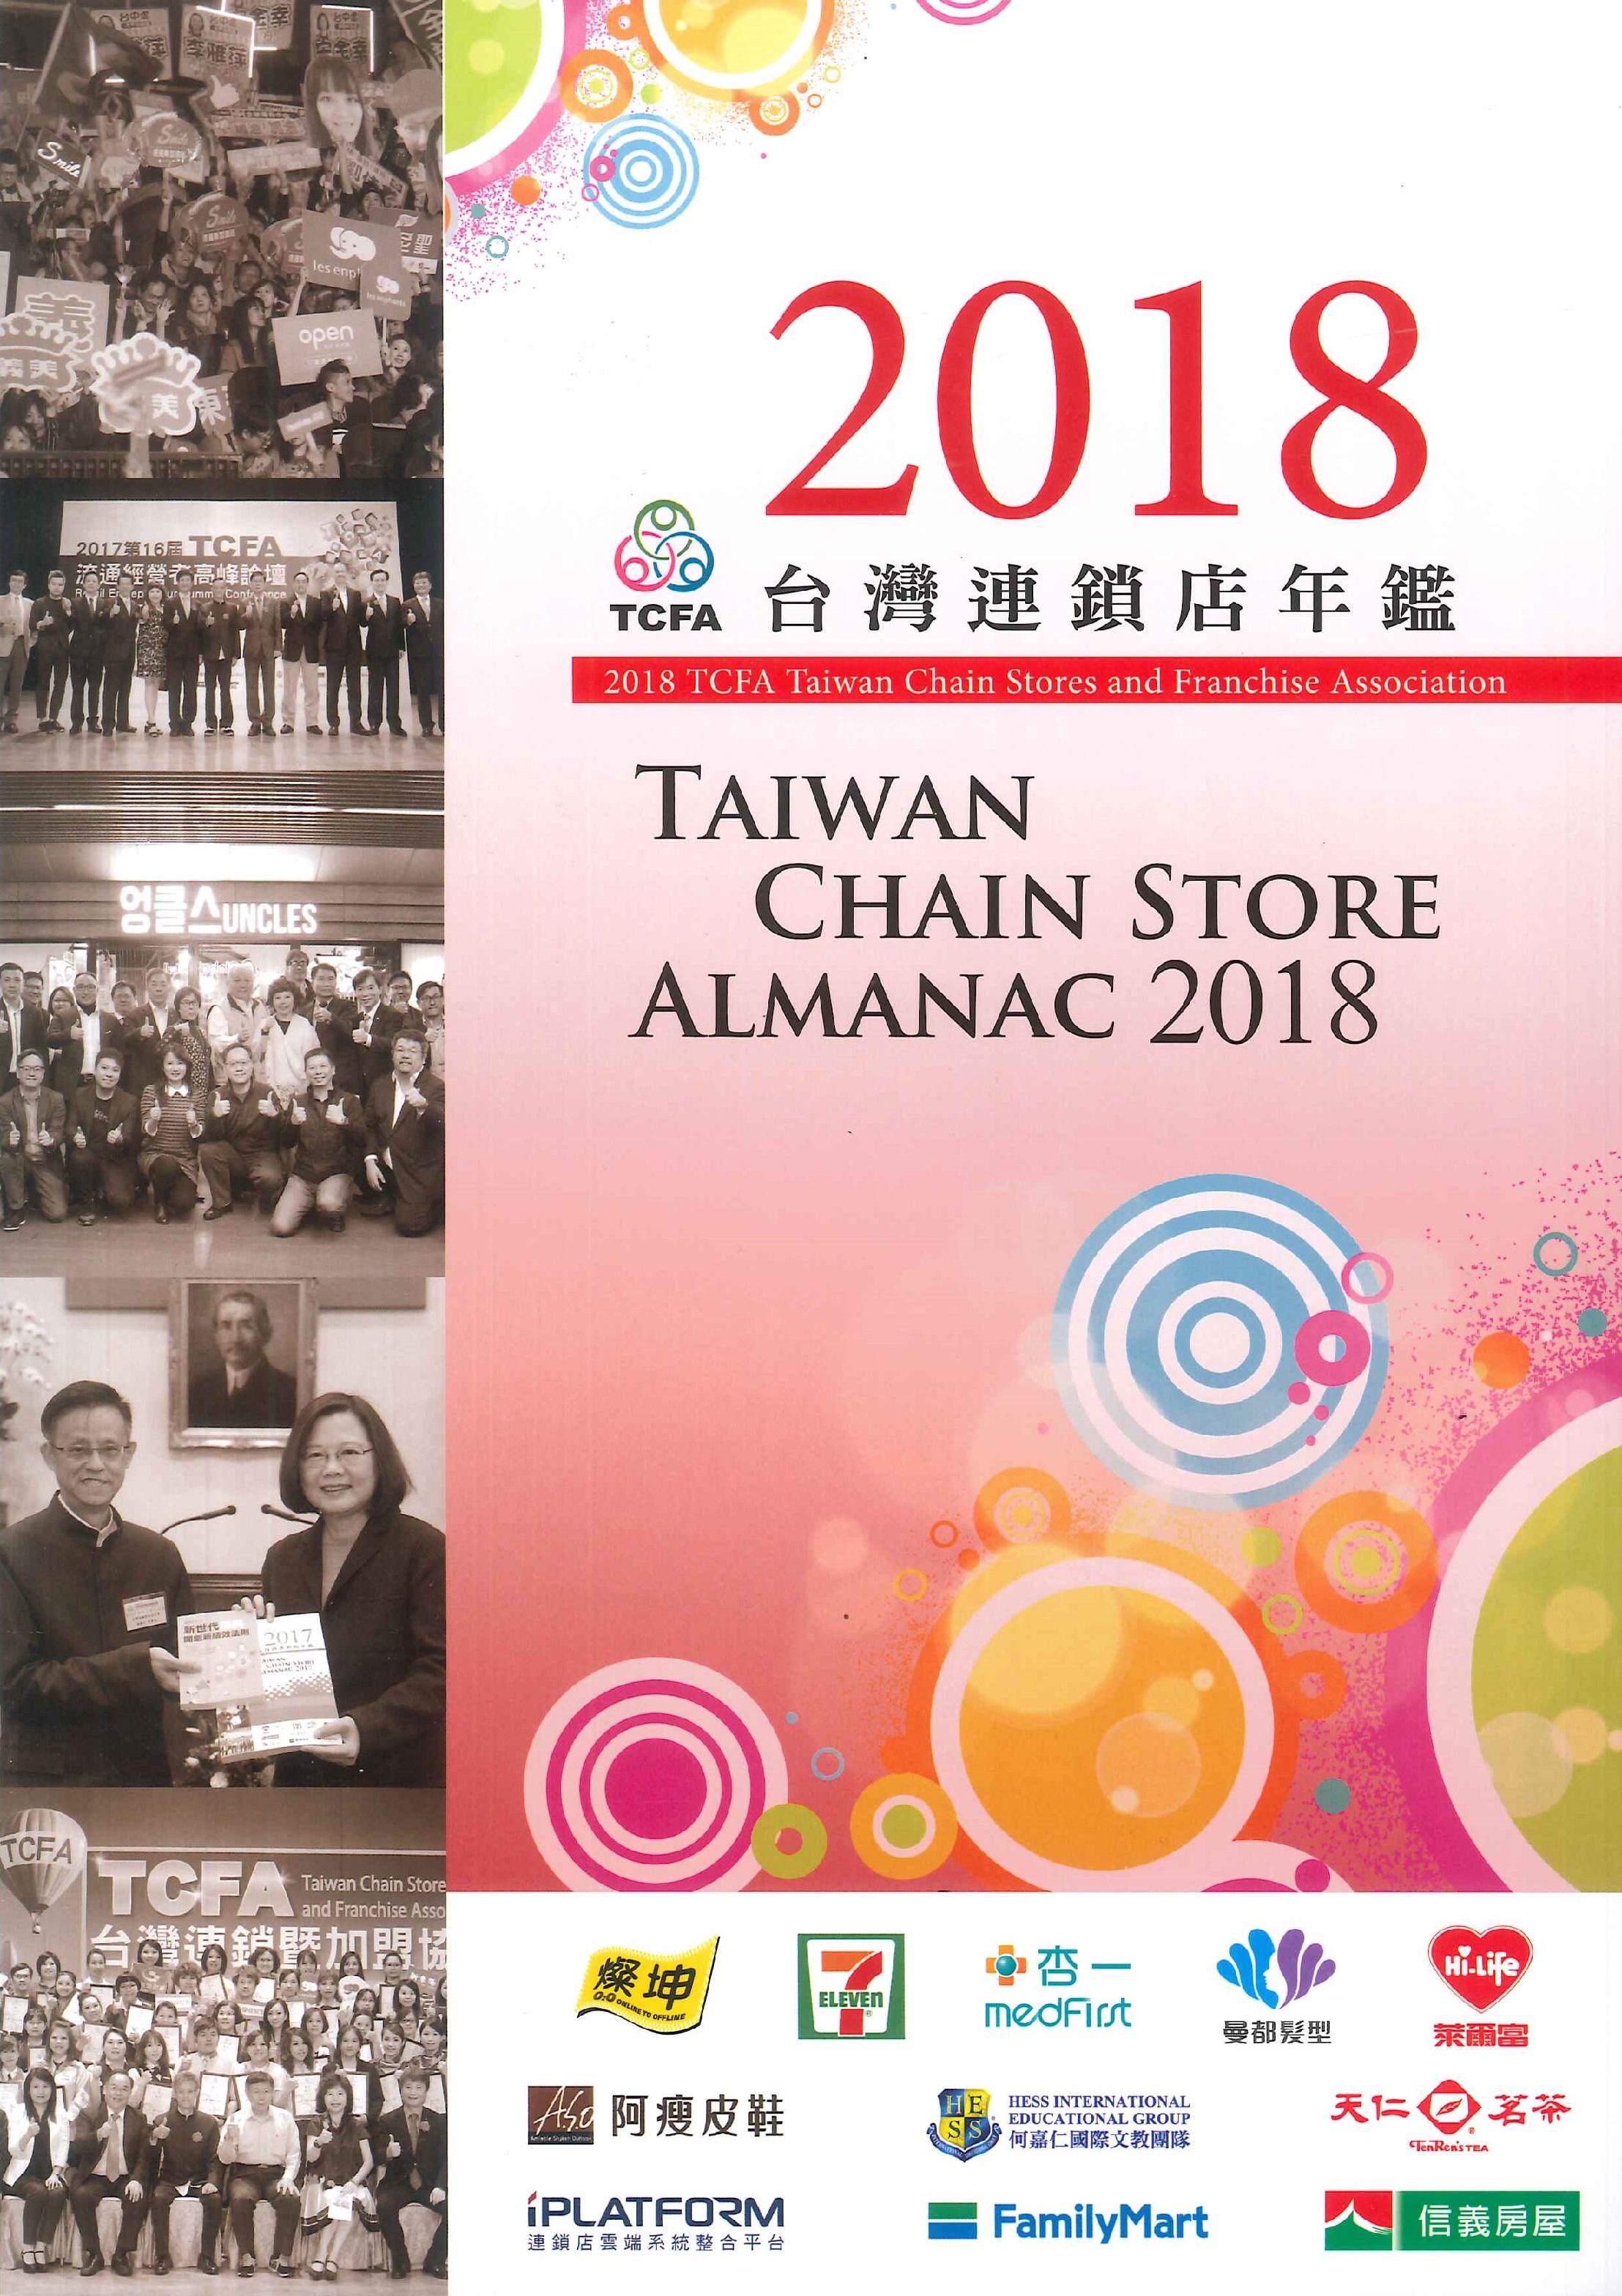 台灣連鎖店年鑑=Taiwan chain store almanac